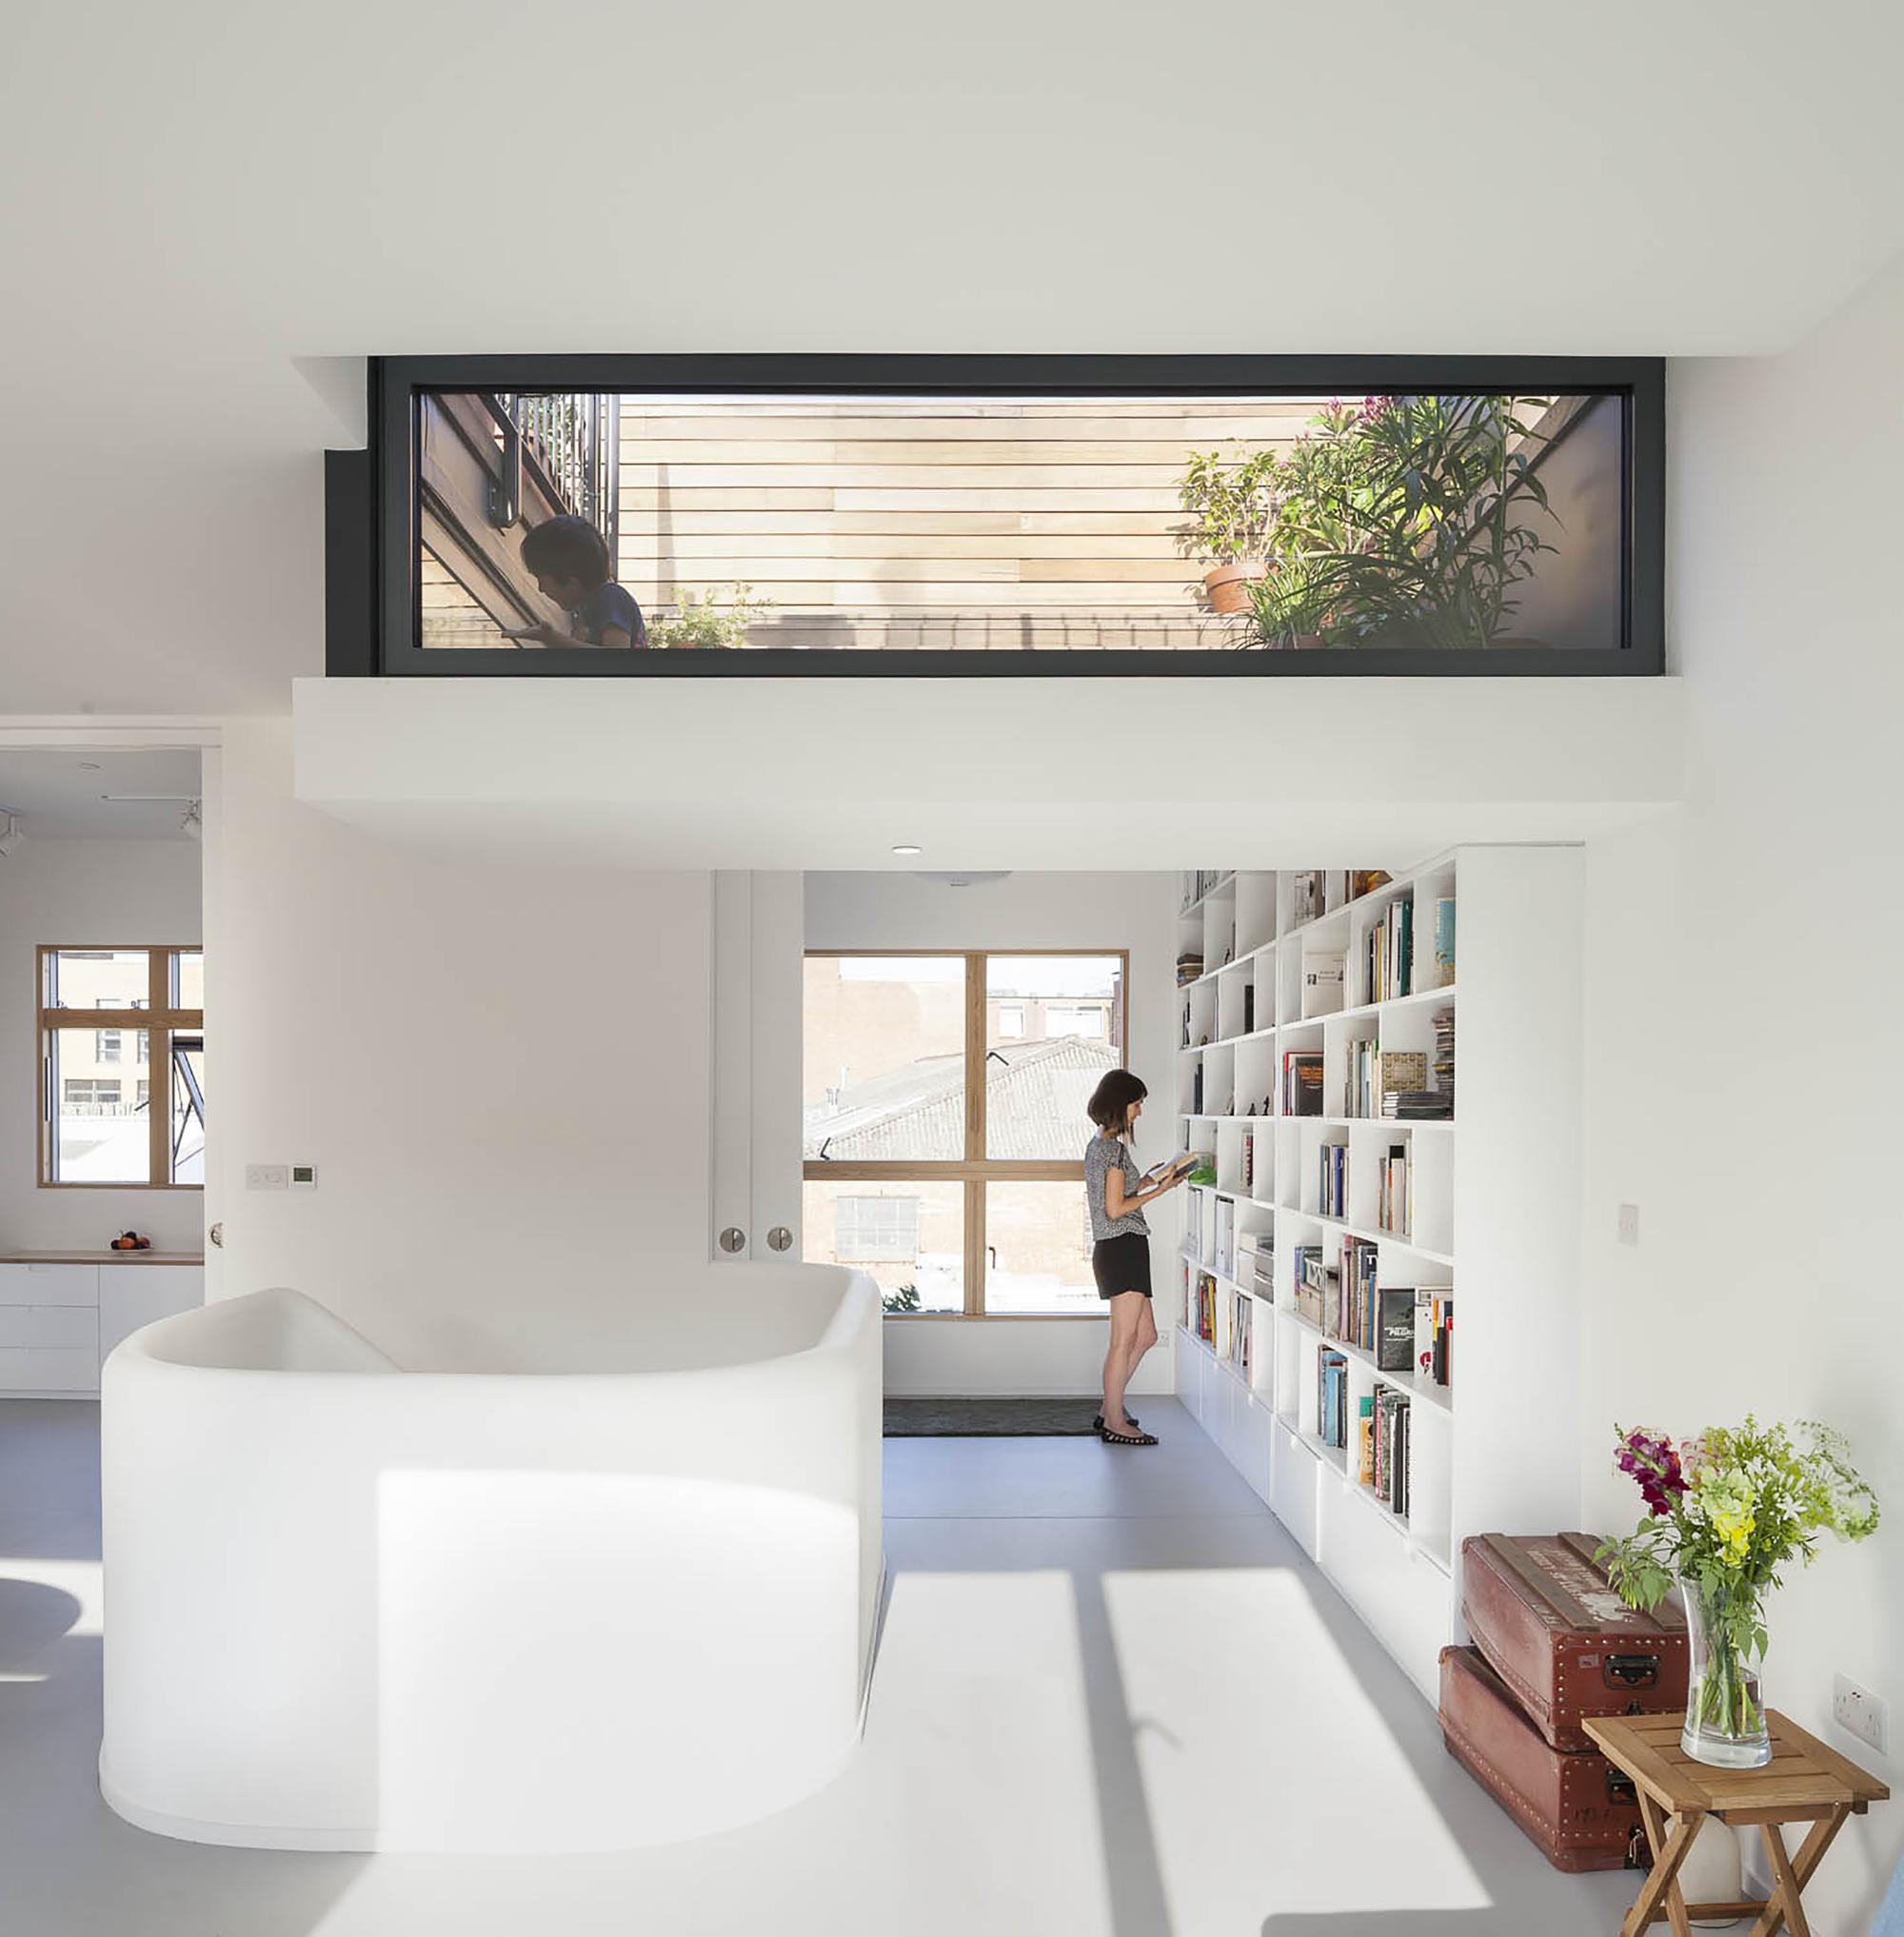 Galeria de london e8 scenario architecture 1 - Lino 5 metre de large ...